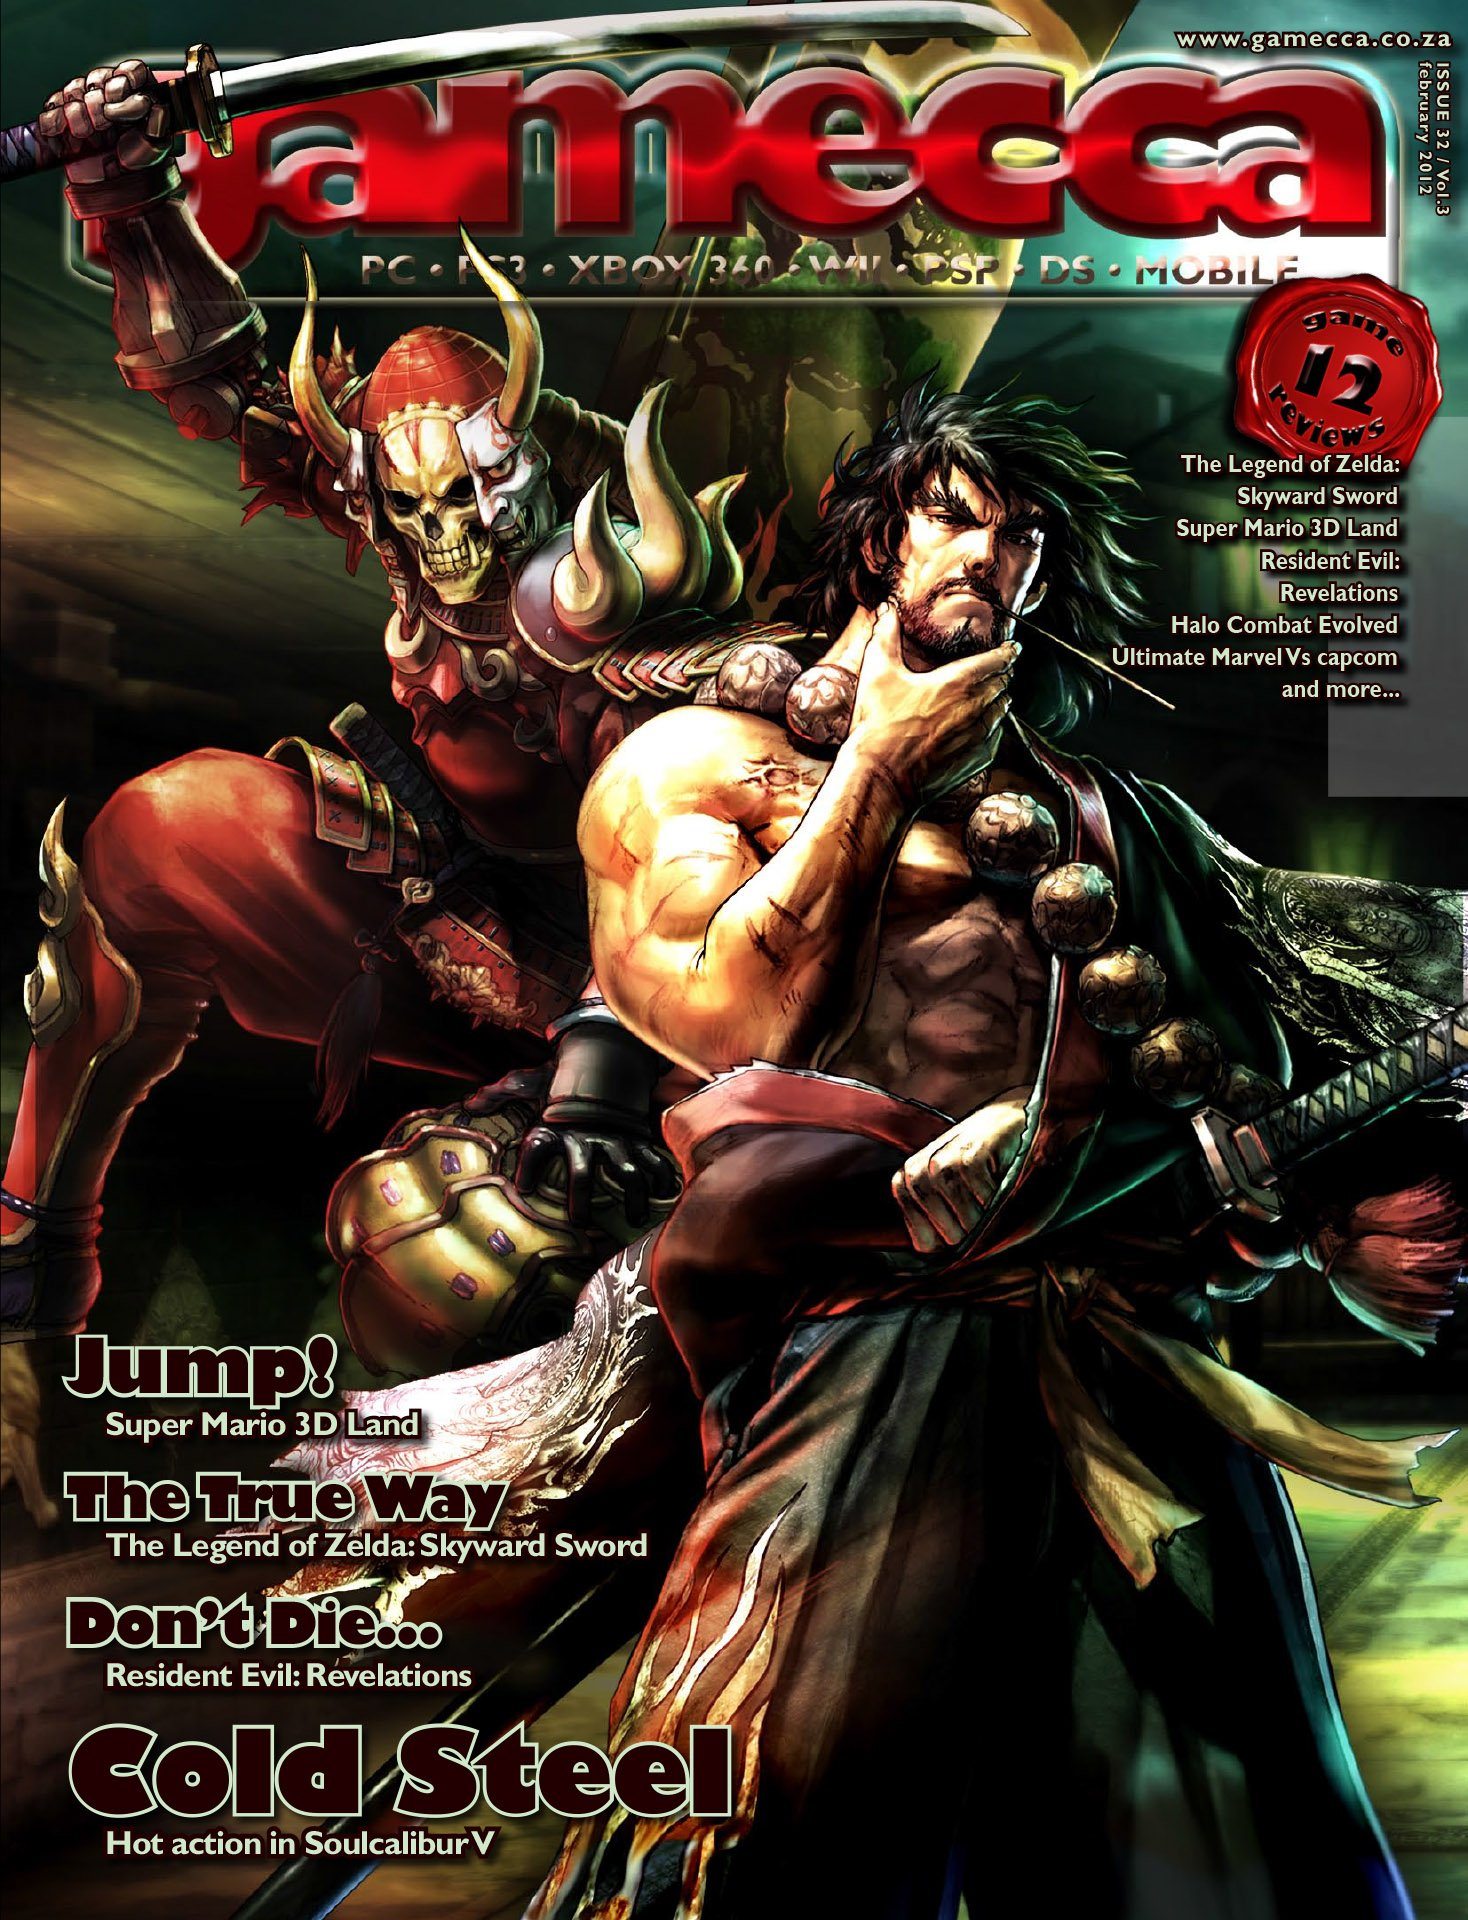 Gamecca 032 (February 2012)